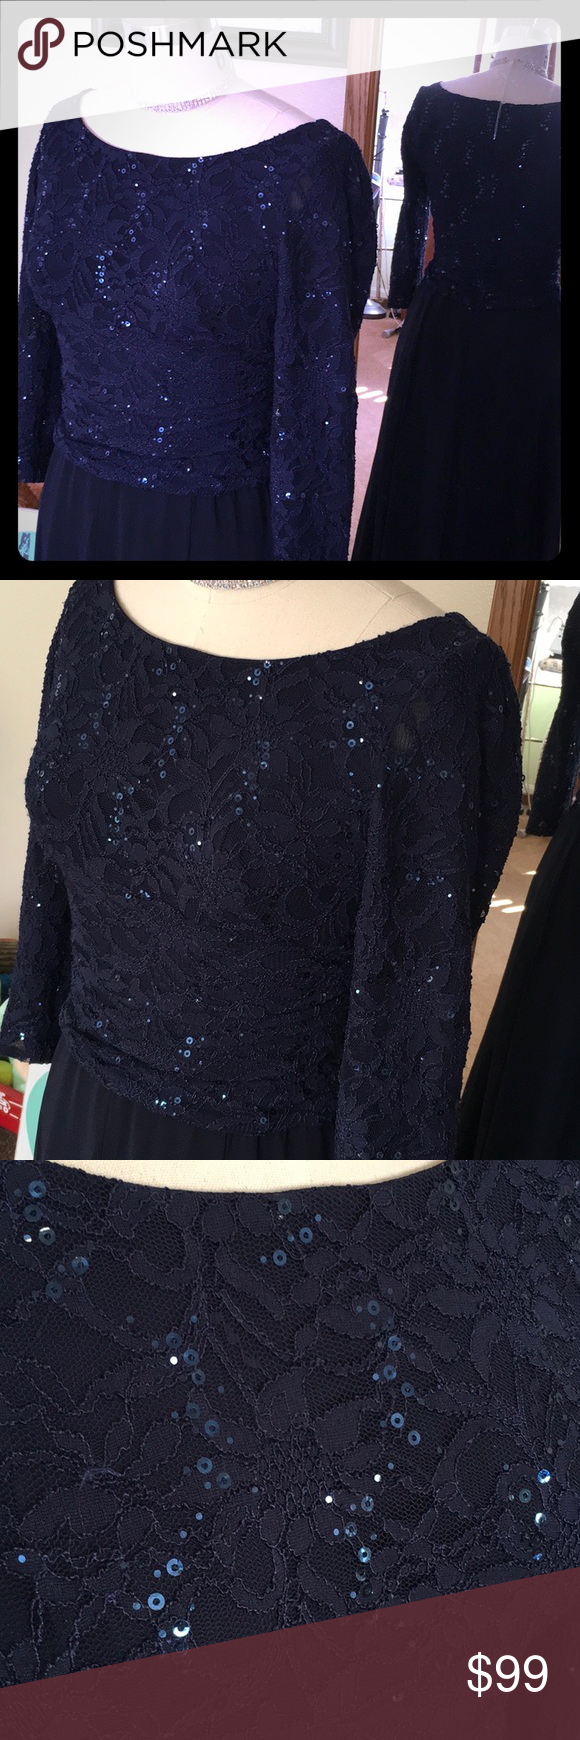 Ralph Lauren Evening Gown Stunner!!! This dress is lightly